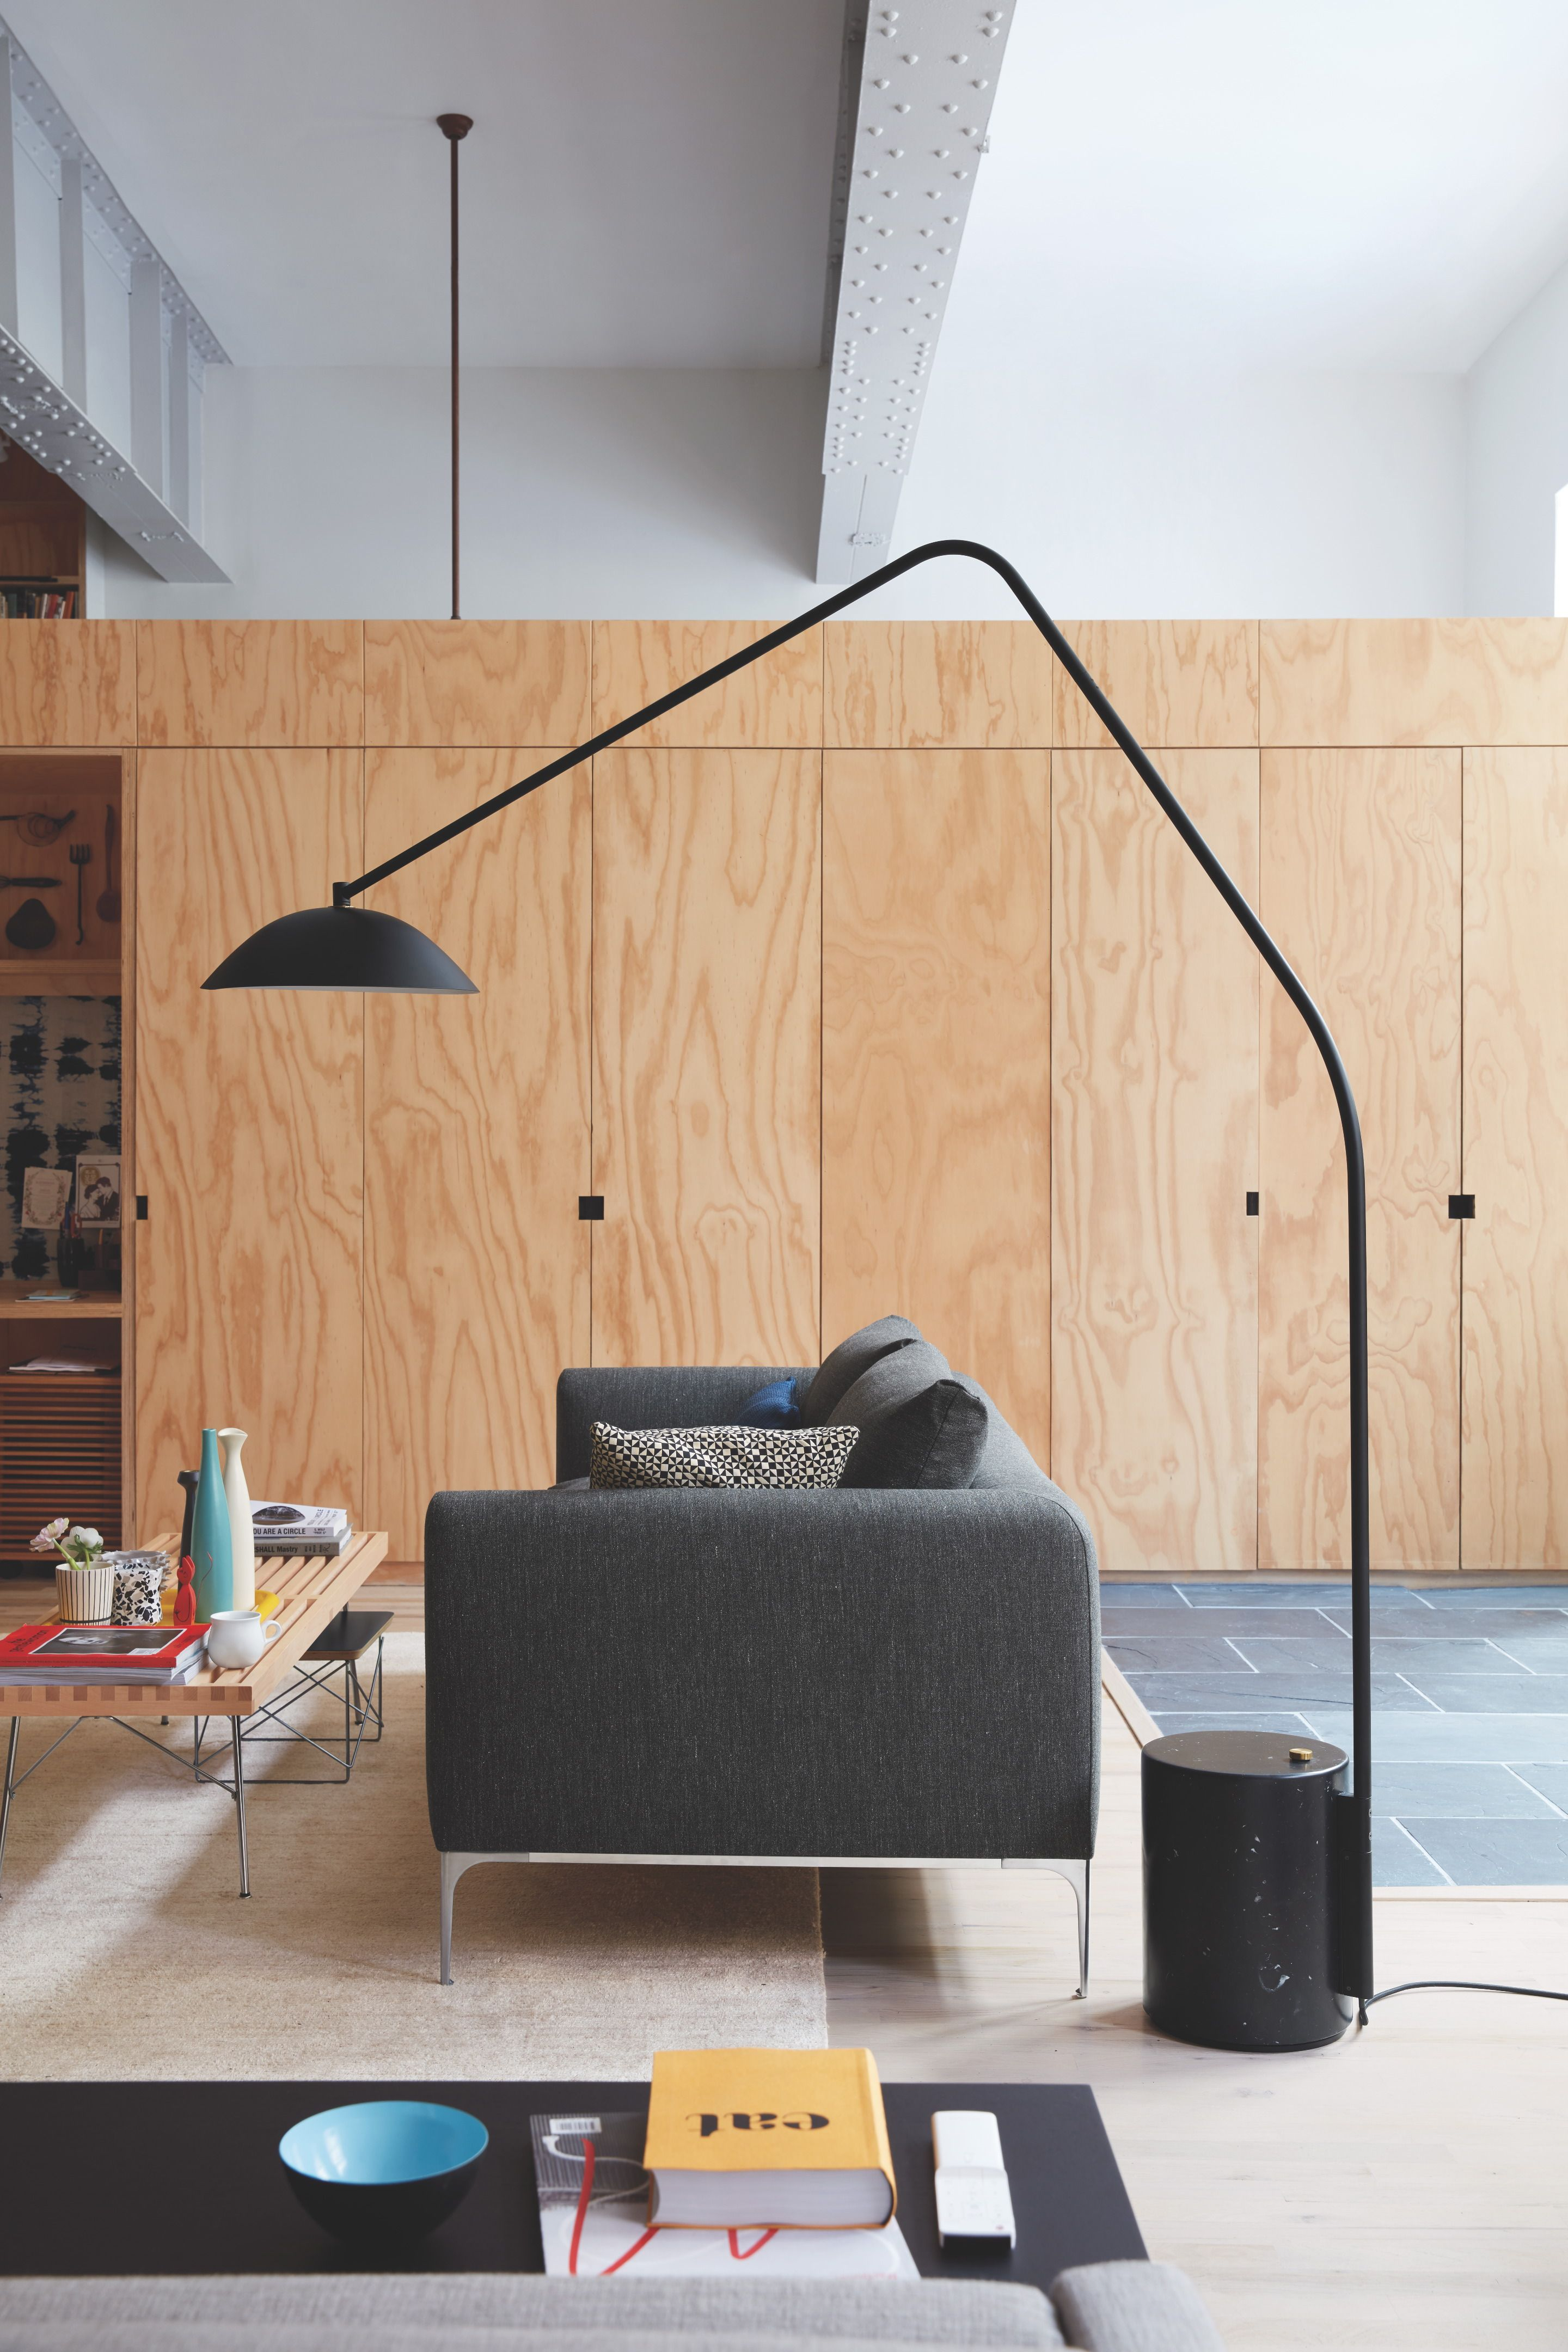 Sten Floor Lamp Design Within Reach Beautiful Floor Lamps Floor Lamp Design Contemporary Floor Lamps